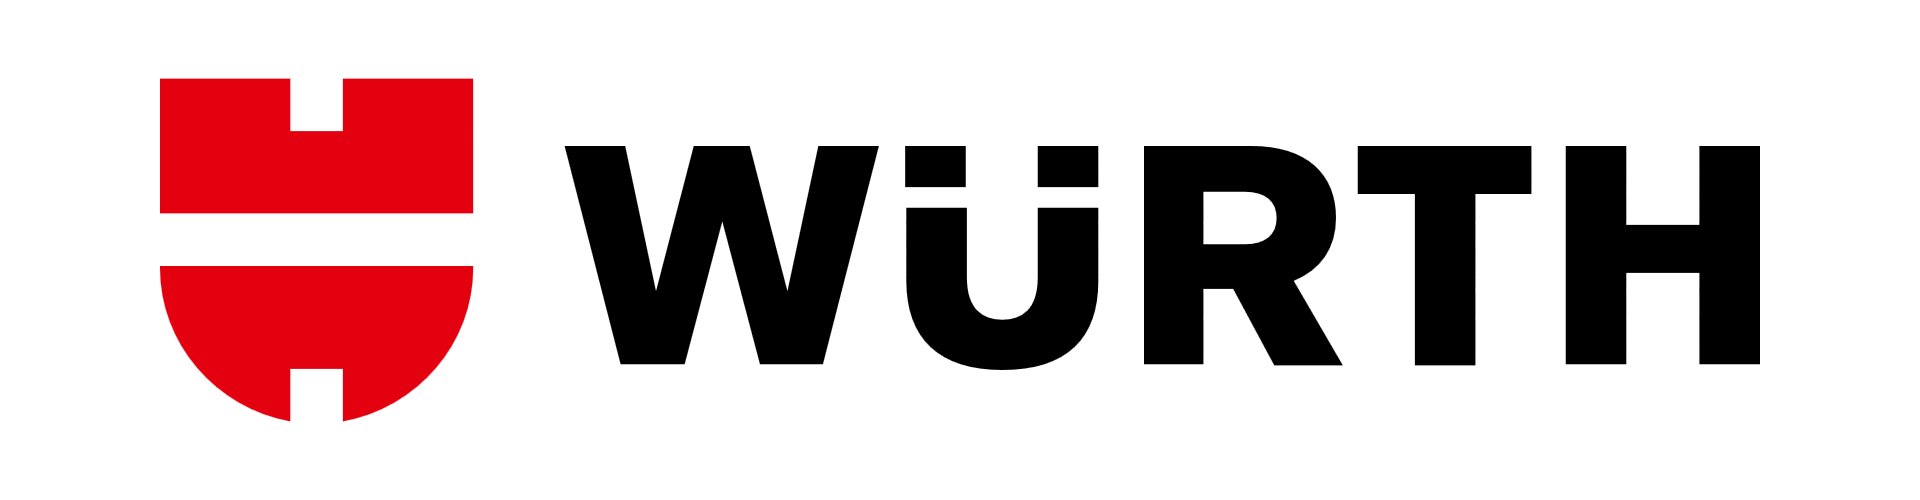 Naslovna slika za RADIONICA